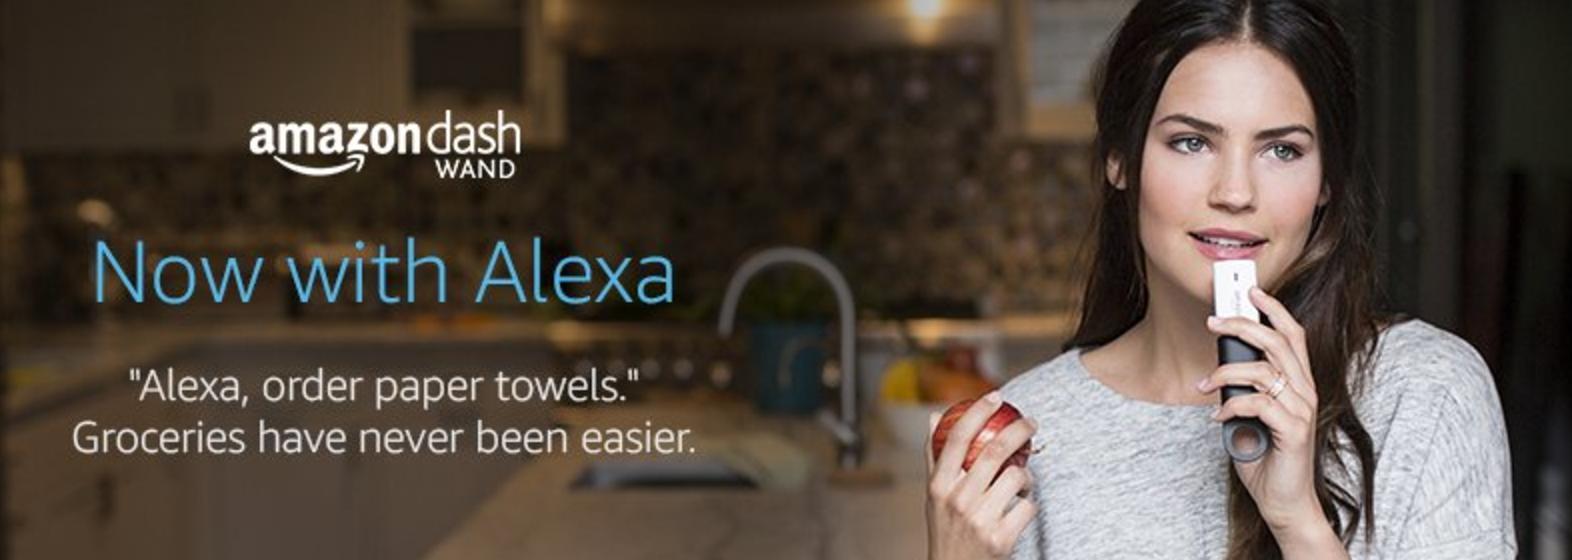 Buy a $20 Amazon Dash Scanner, Get $20 Credit + 90 Days FREE Amazon Fresh (reg. $14.99/month)!